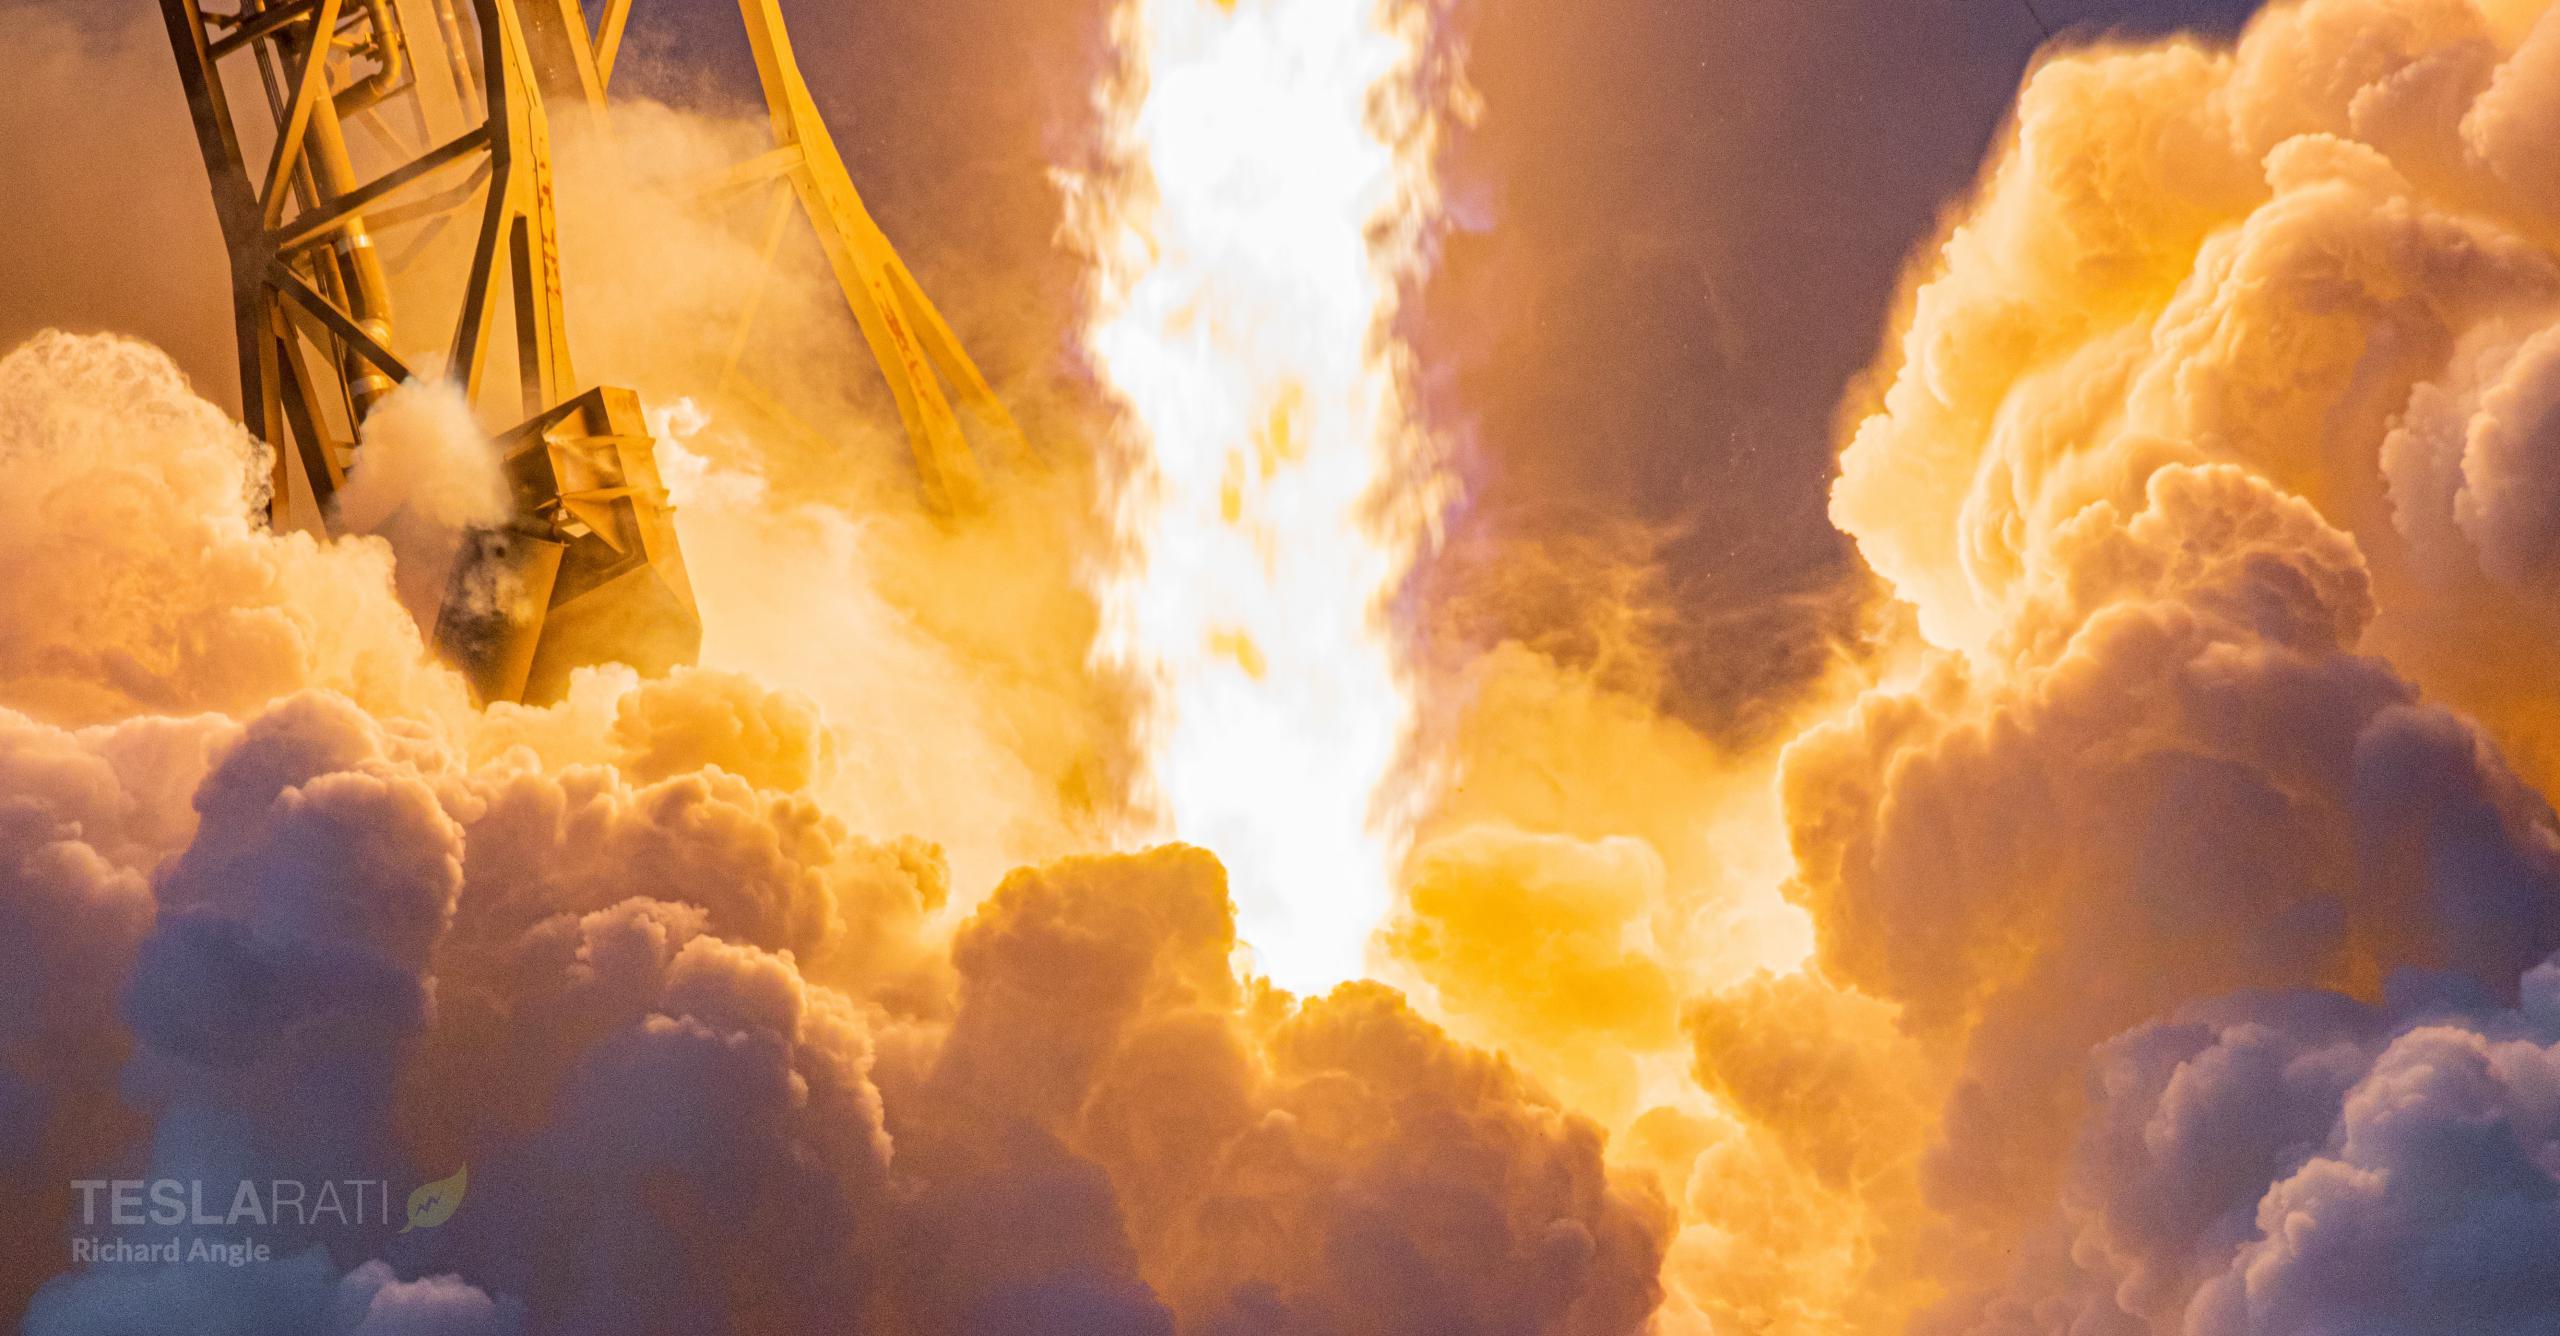 Transporter-1 Falcon 9 B1058 LC-40 012421 (Richard Angle) launch 8 crop (c)